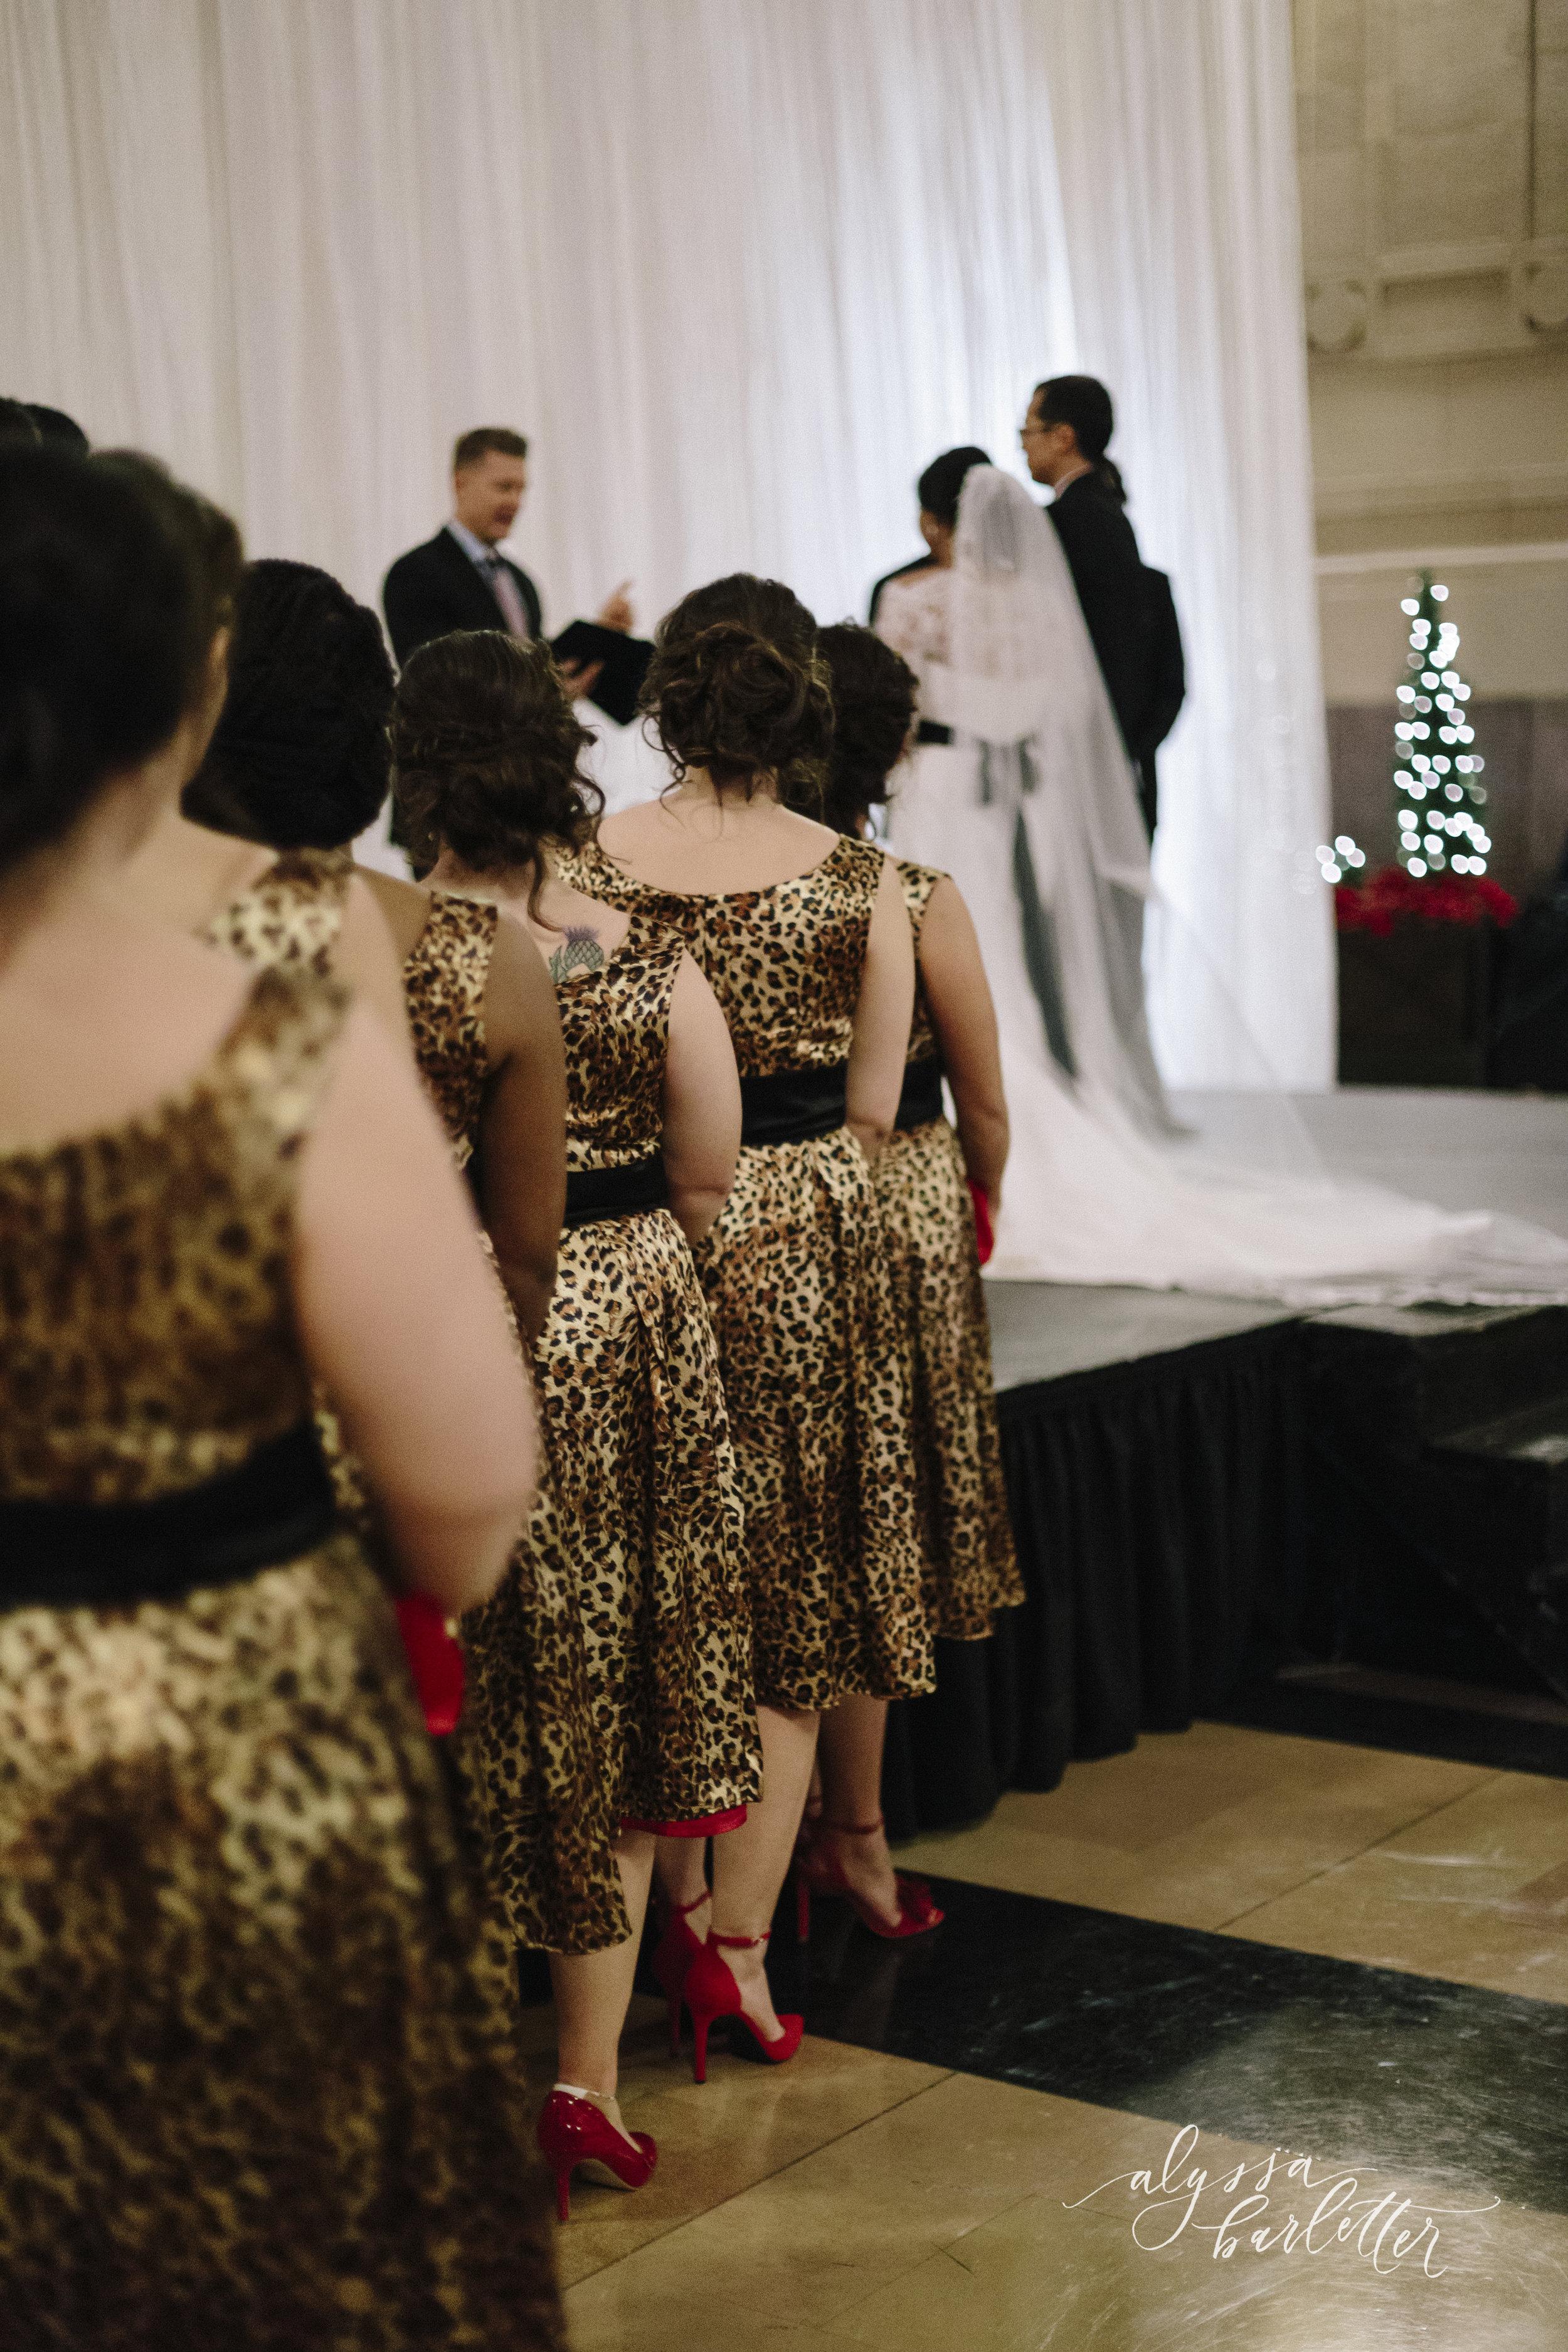 alyssa barletter photography union station wedding photos leopard print winter wedding-1-42.jpg